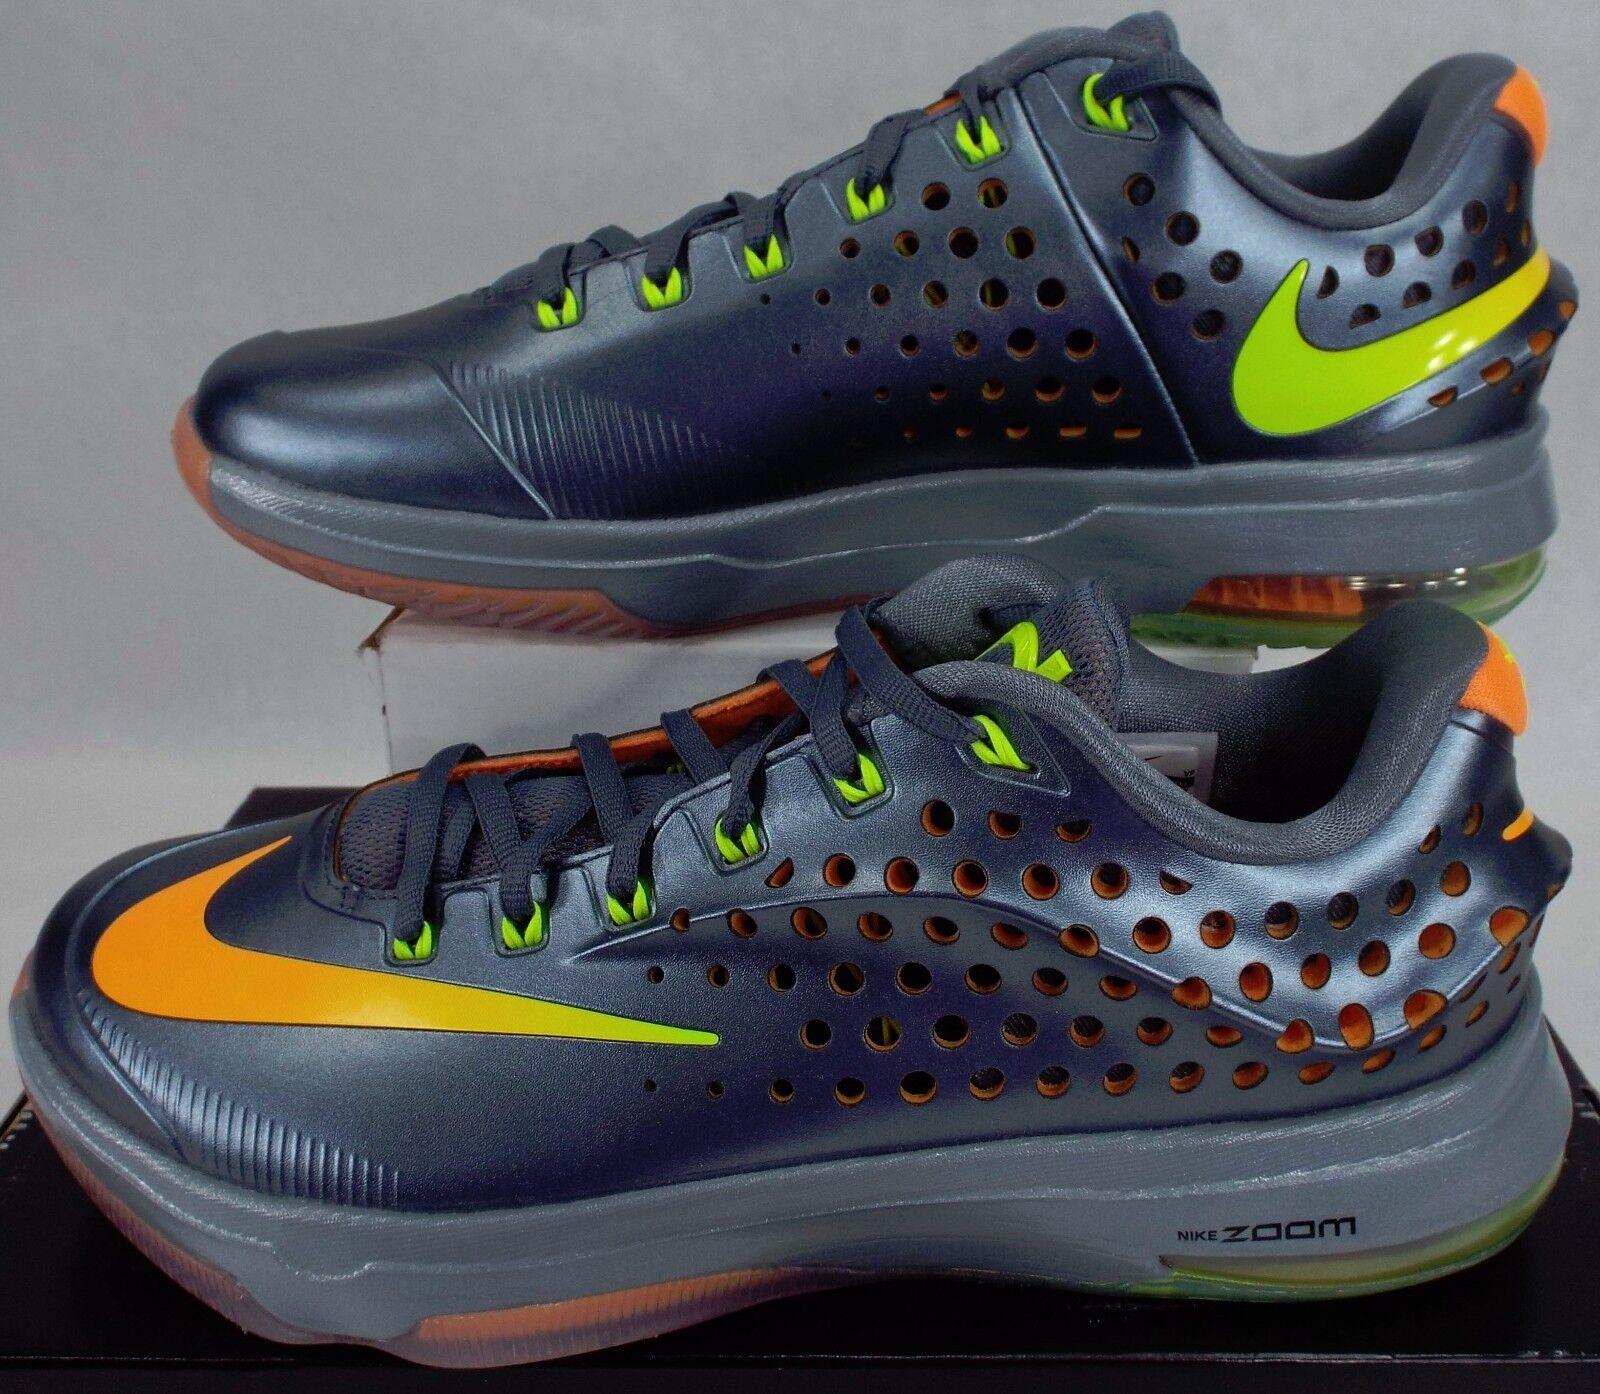 New New New homme 10 NIKE KD VII Elite Bleu Graphite chaussures 200 724349-478 2dd118